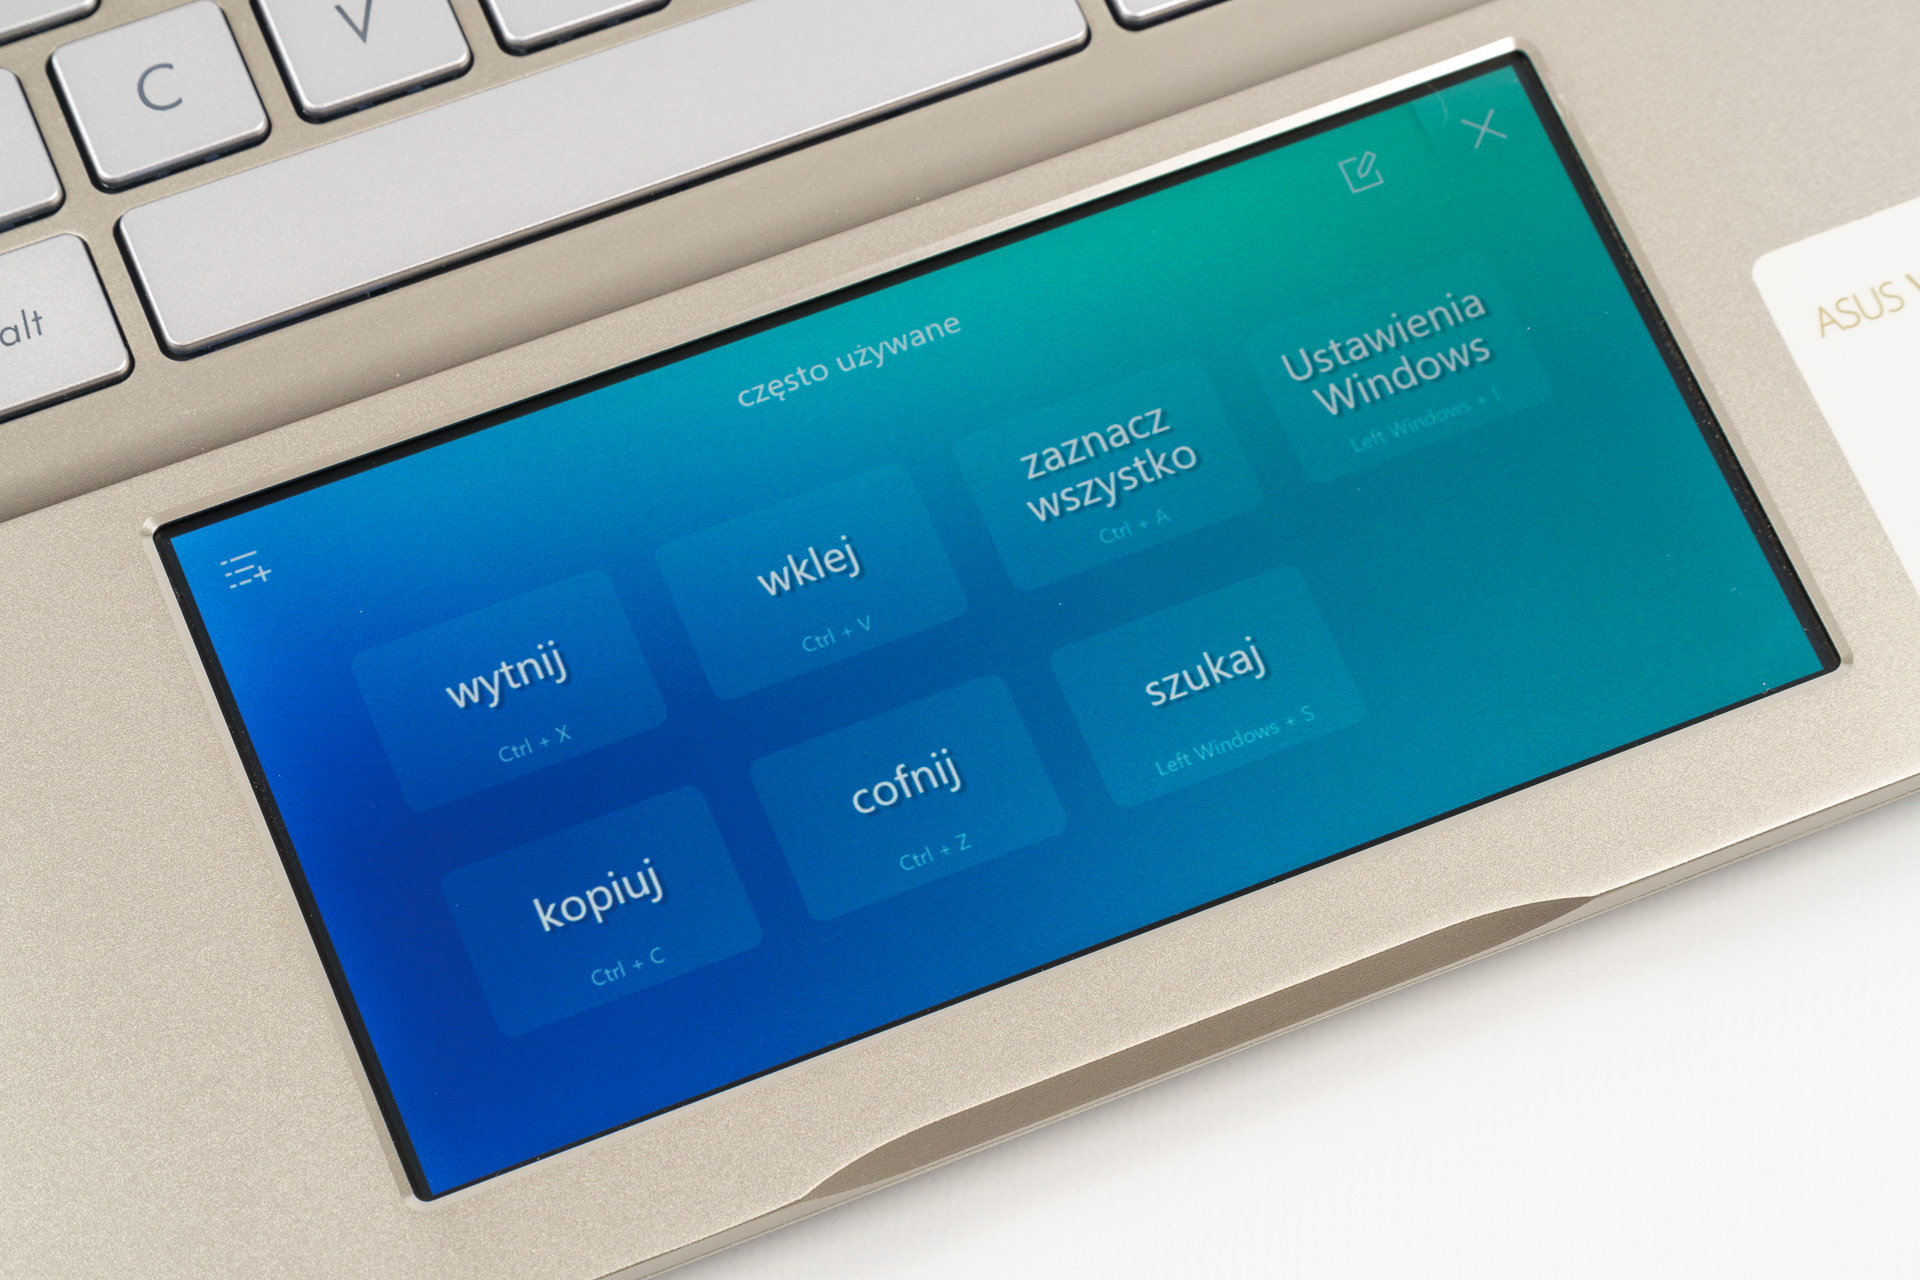 Asus VivoBook ze ScreenPadem, czyli po co w notebooku drugi ekran? 20